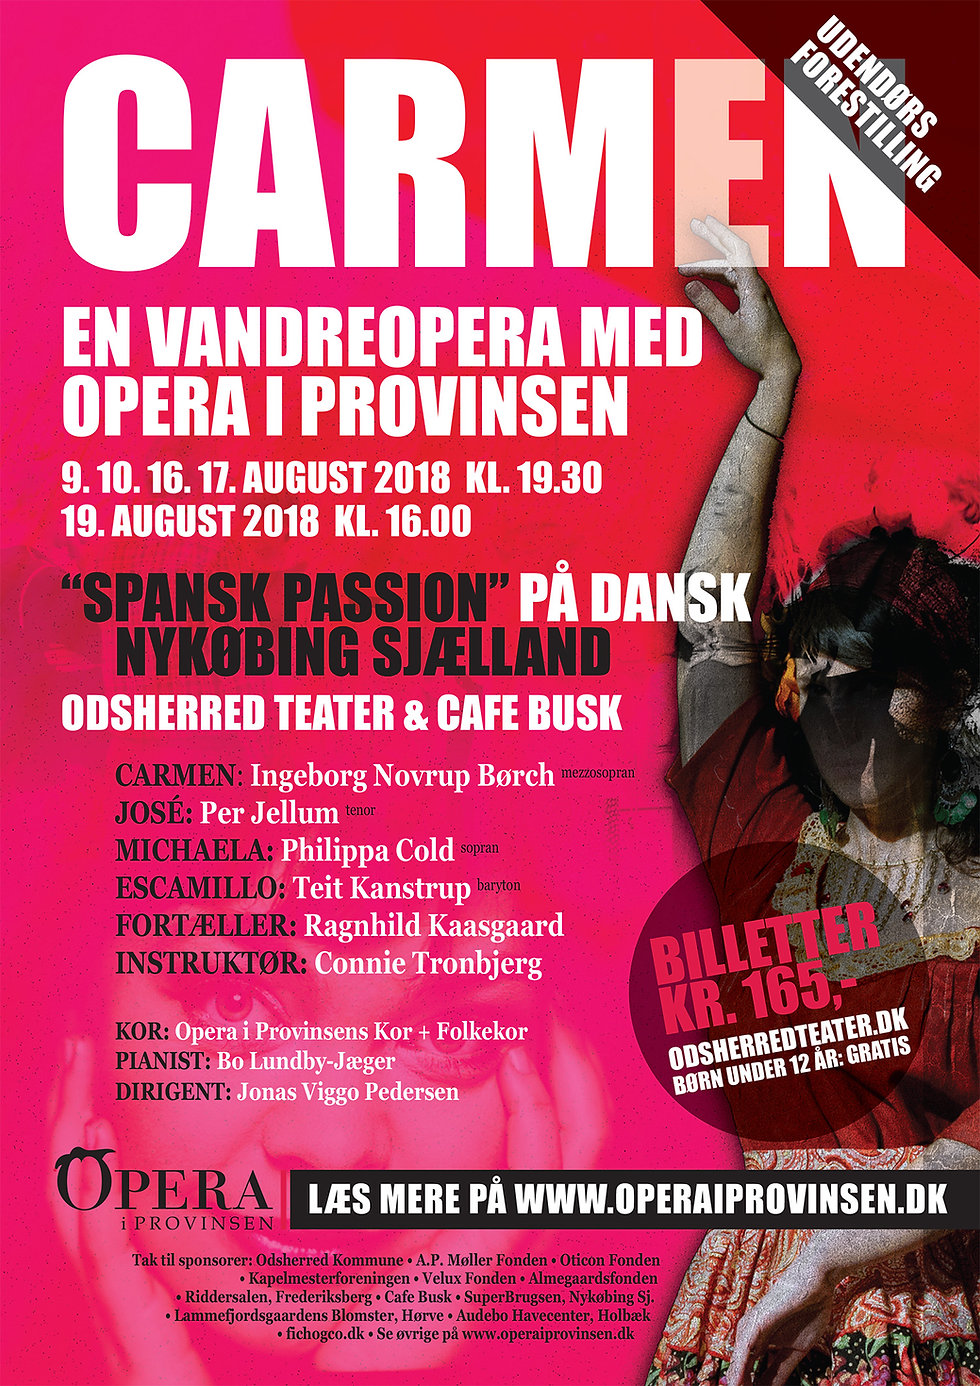 Opera i provinsen Carmen vandreopera plakat